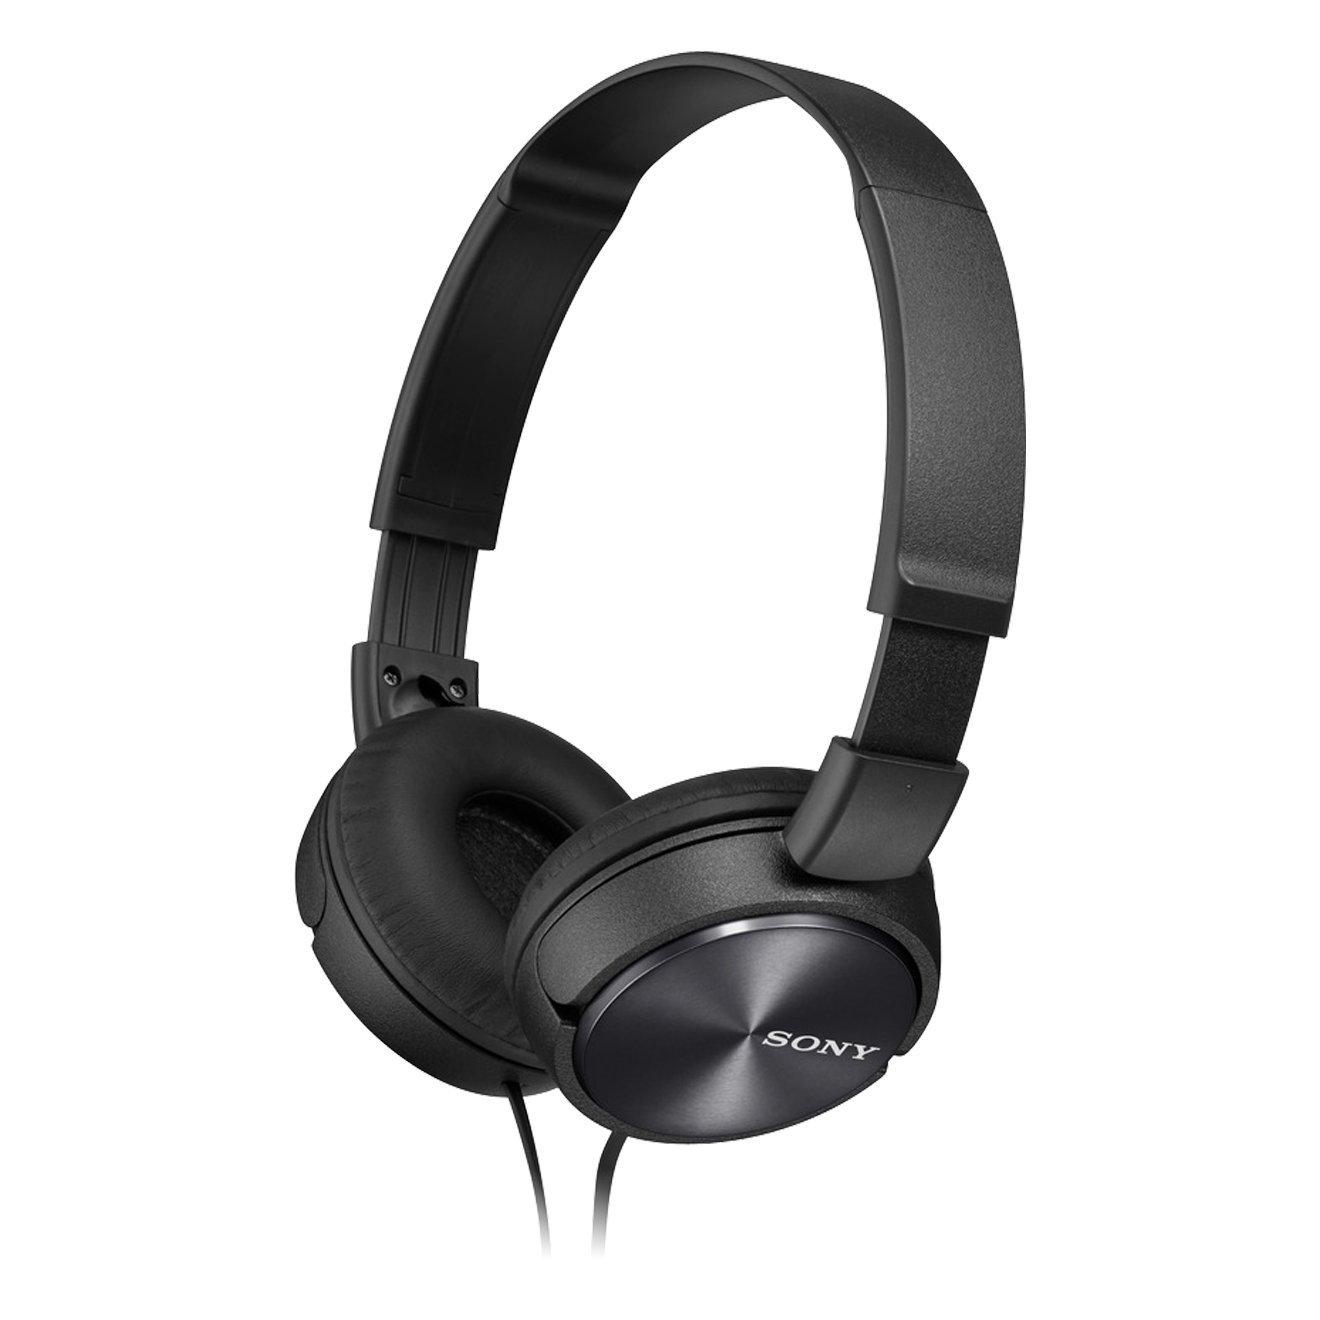 Sony MDRZX310APB Folding Stereo Headphones|Smartphone Mic Control|Metallic Black